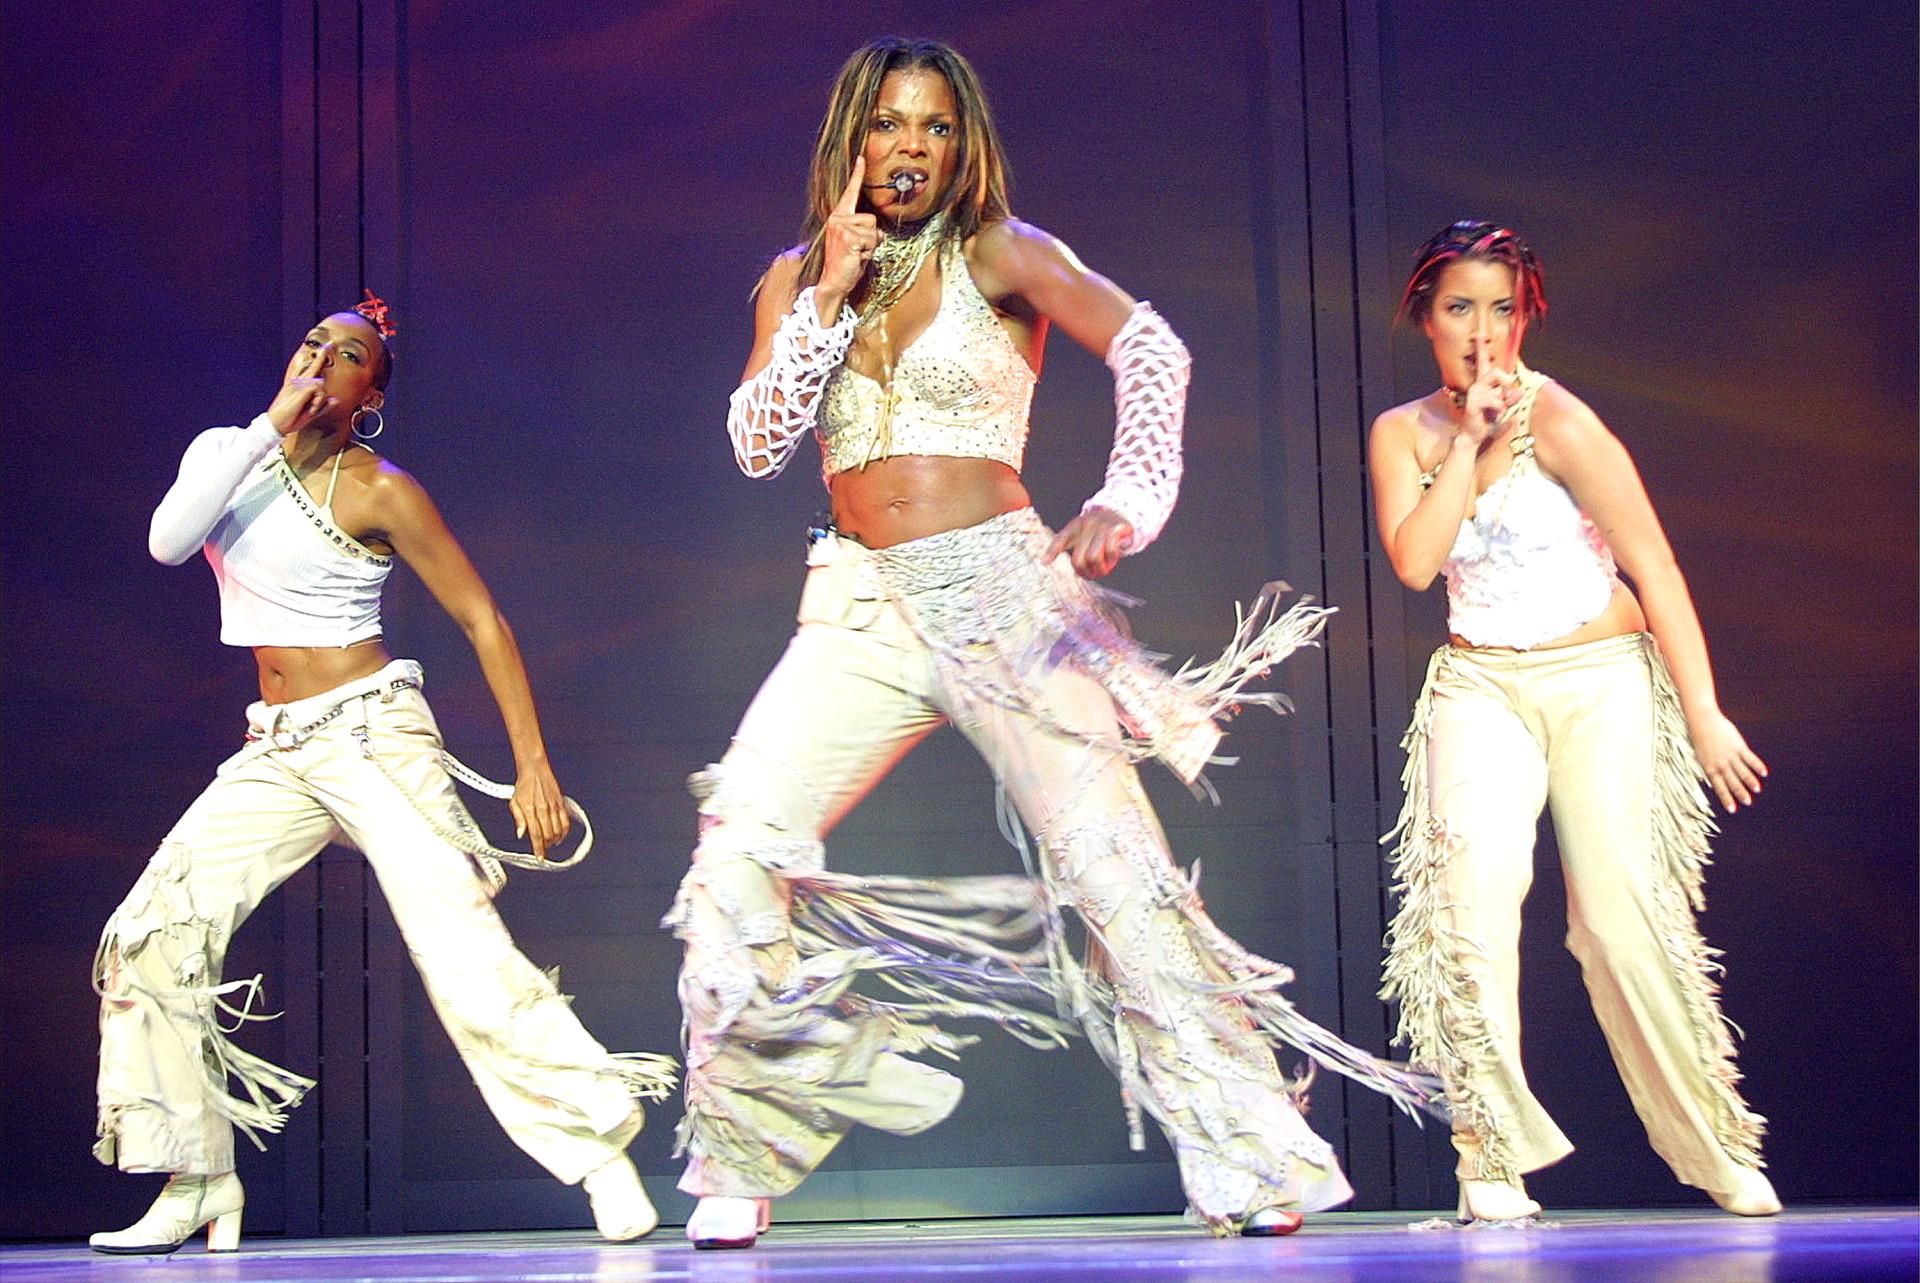 Janet Jackson's most iconic looks